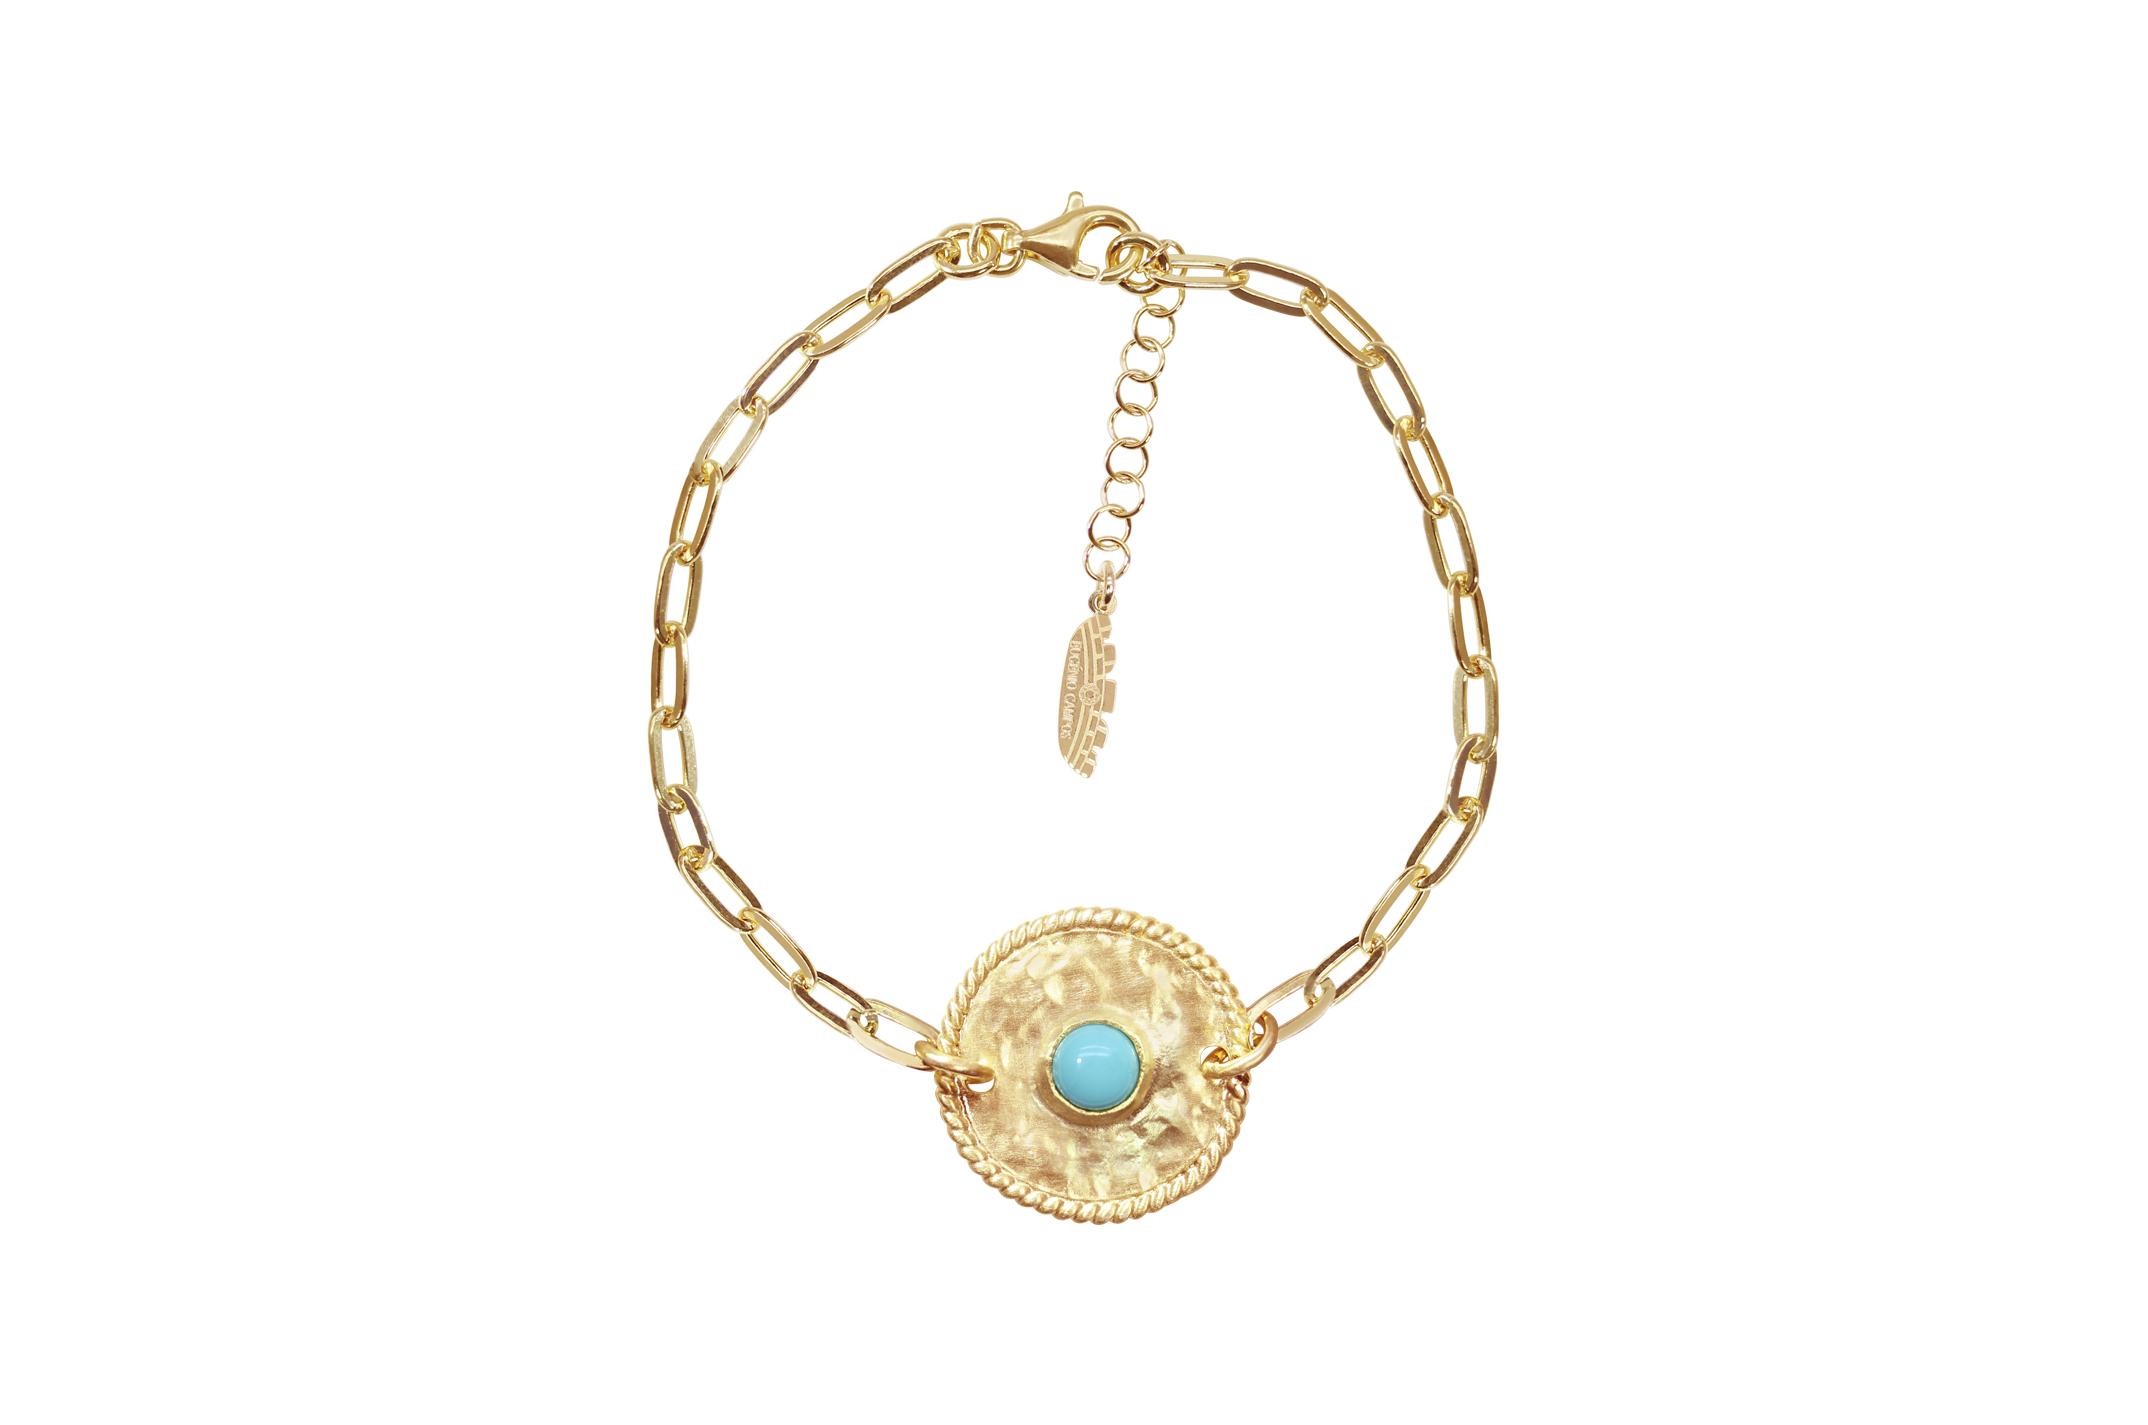 Joia: pulseira;Material: prata 925;Peso: 5.90 gr;Pedras: turquesa;Cor: amarelo;Medida Fio: cm;Medida Pendente:  cm;Género: mulher